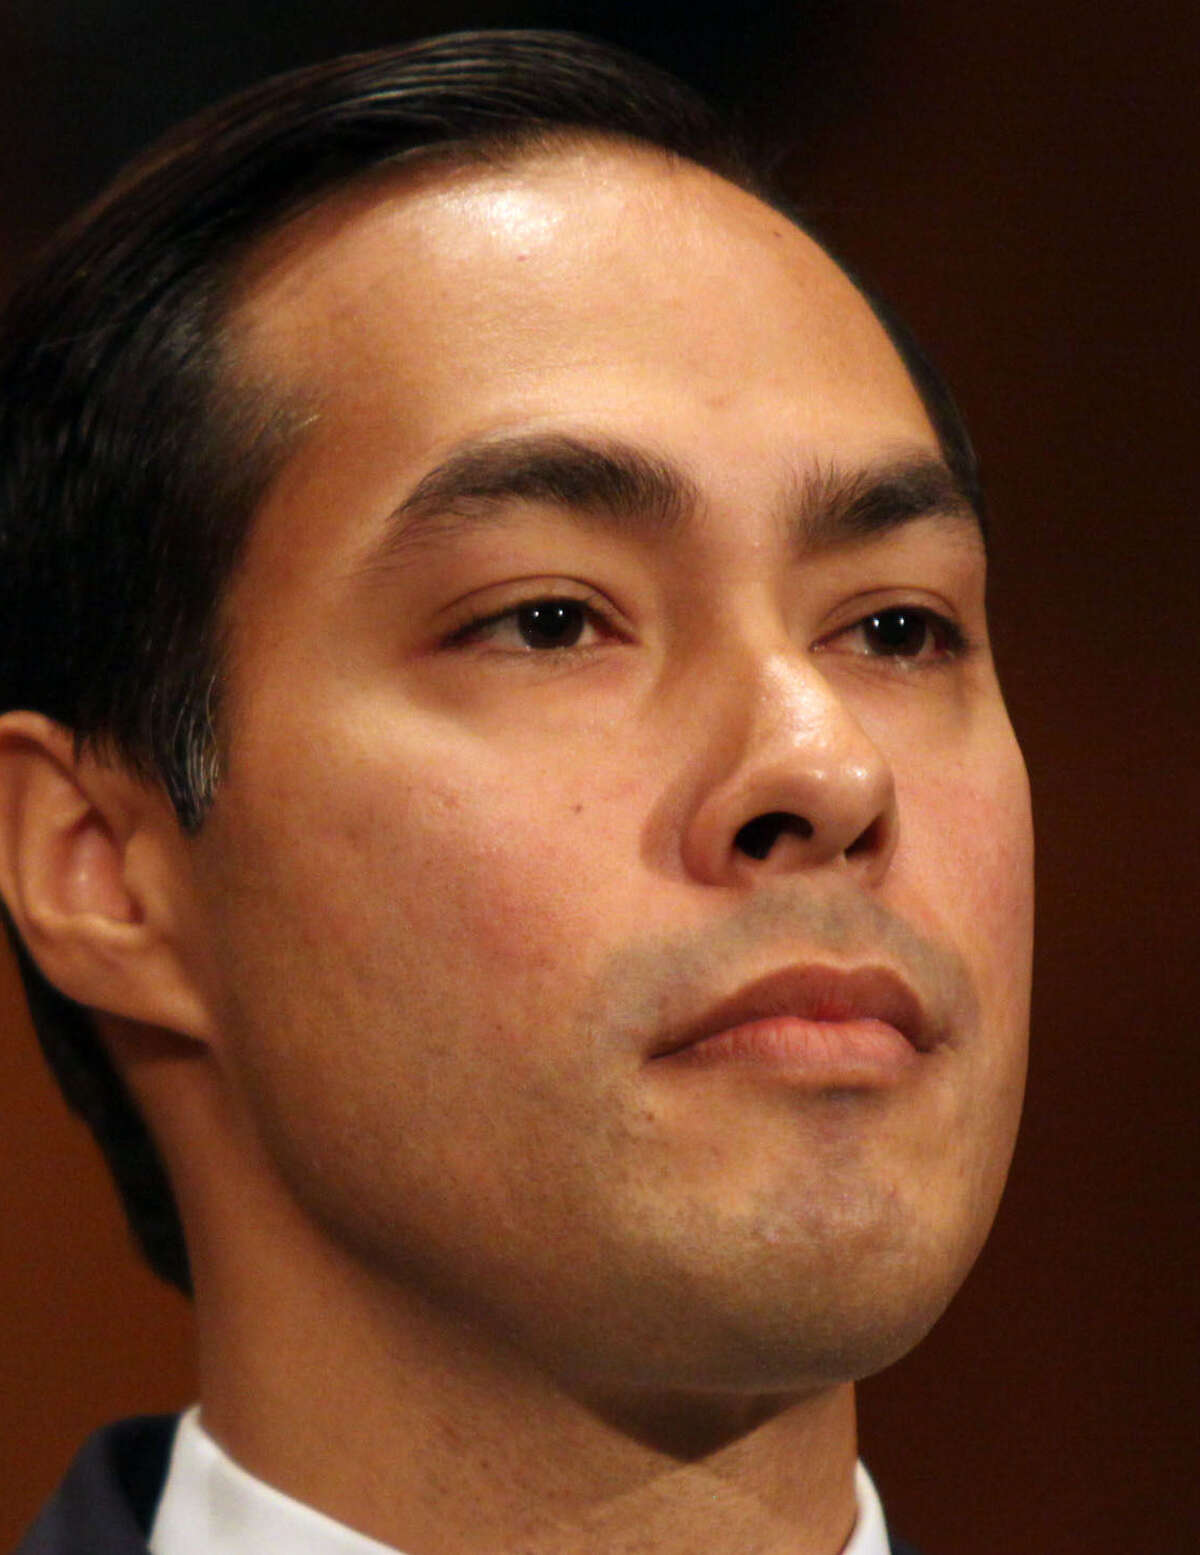 Mayor Julián Castro is awaiting Senate confirmation as the next HUD secretary.